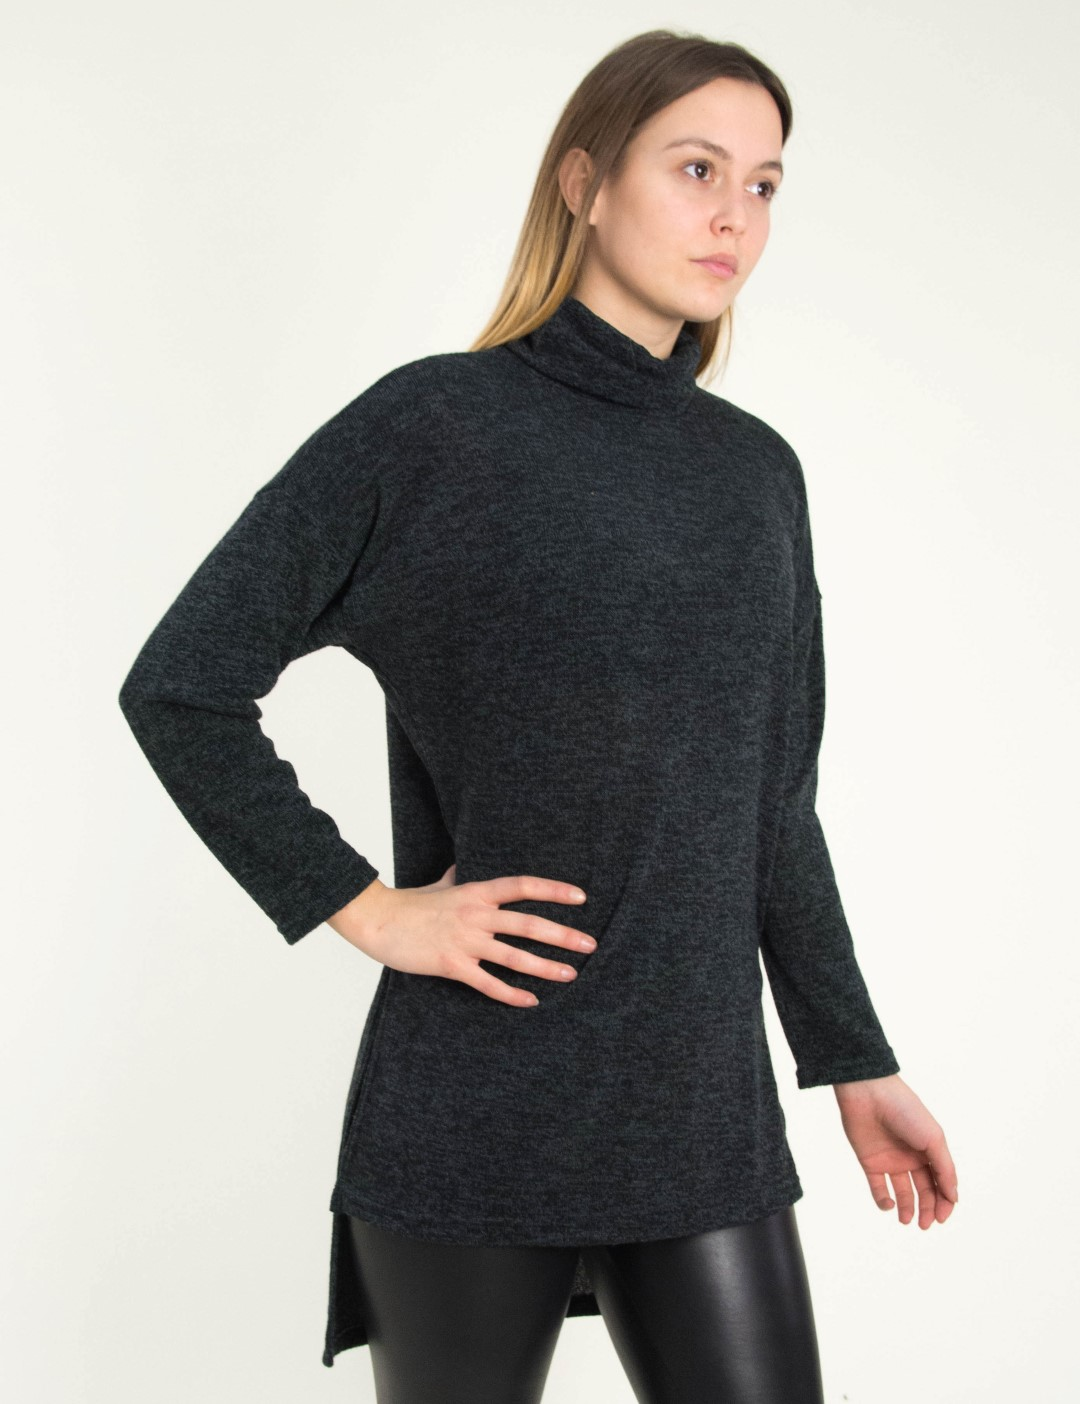 68c559e109b5 Γυναικεία ανθρακί ασσύμετρη πλεκτή μπλούζα ζιβάγκο 11760328